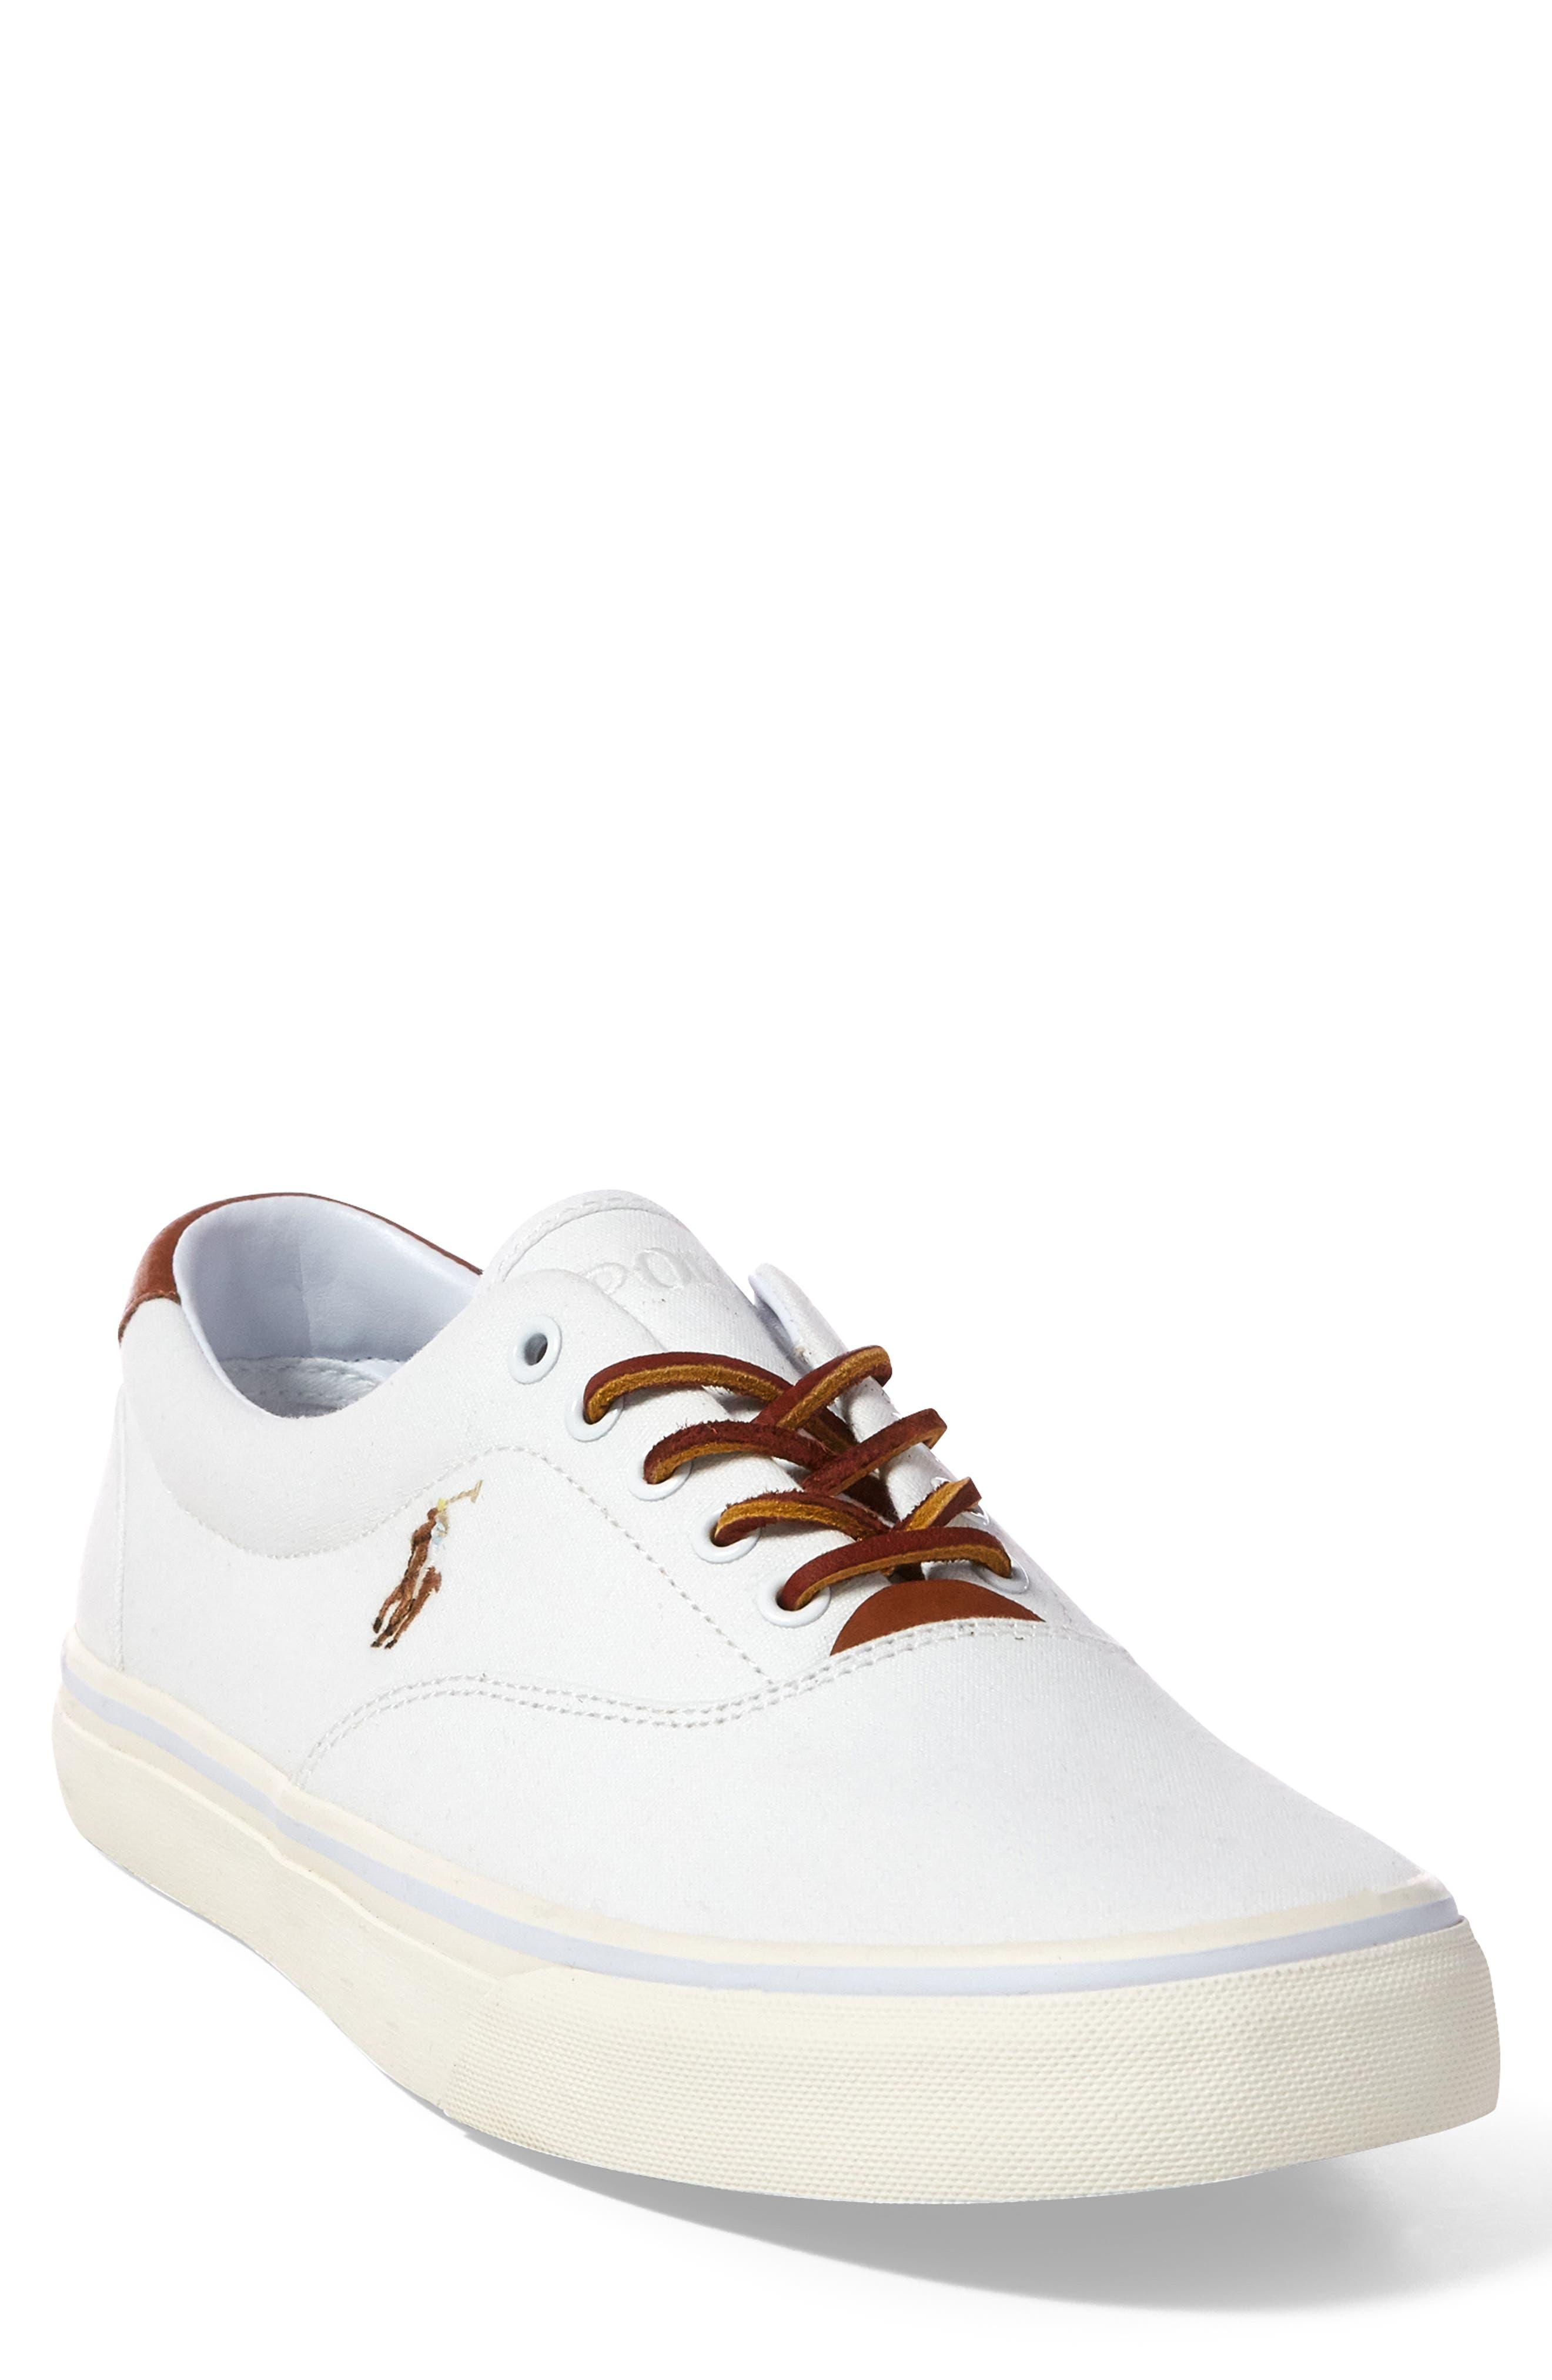 POLO RALPH LAUREN,                             Thorton Low Top Sneaker,                             Main thumbnail 1, color,                             WHITE CANVAS